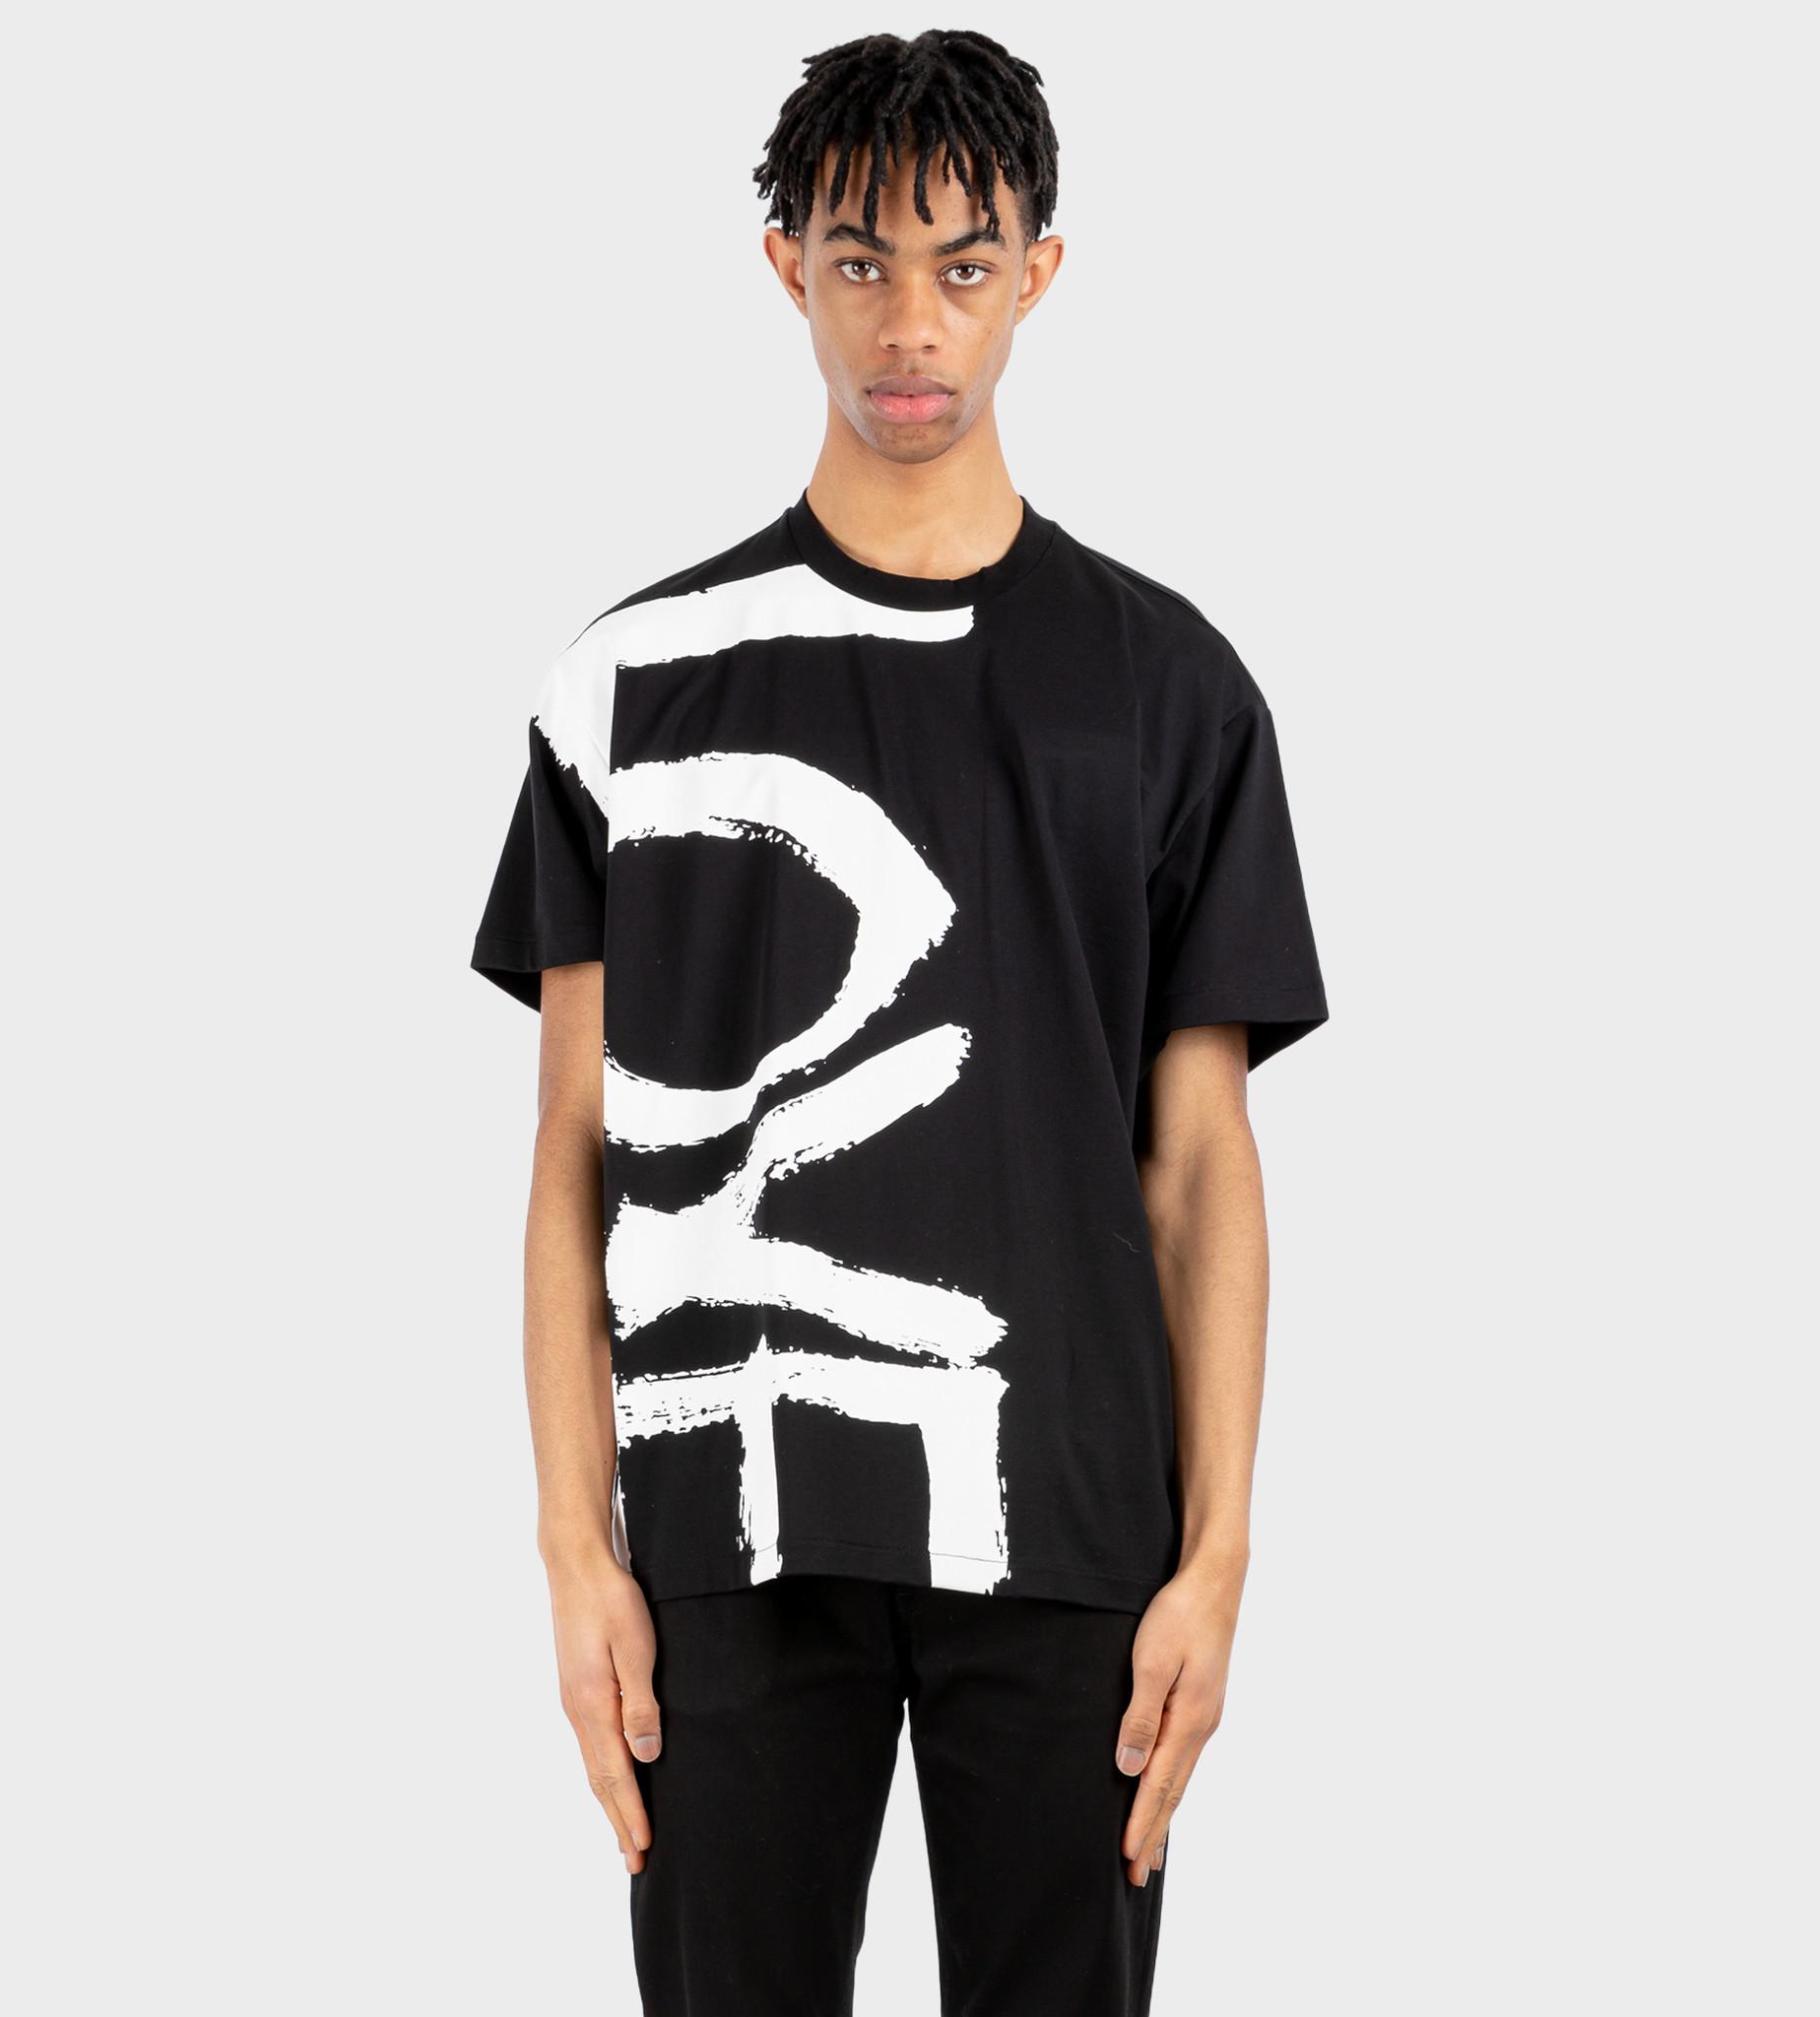 BURBERRY Love Print Oversized T-shirt Black